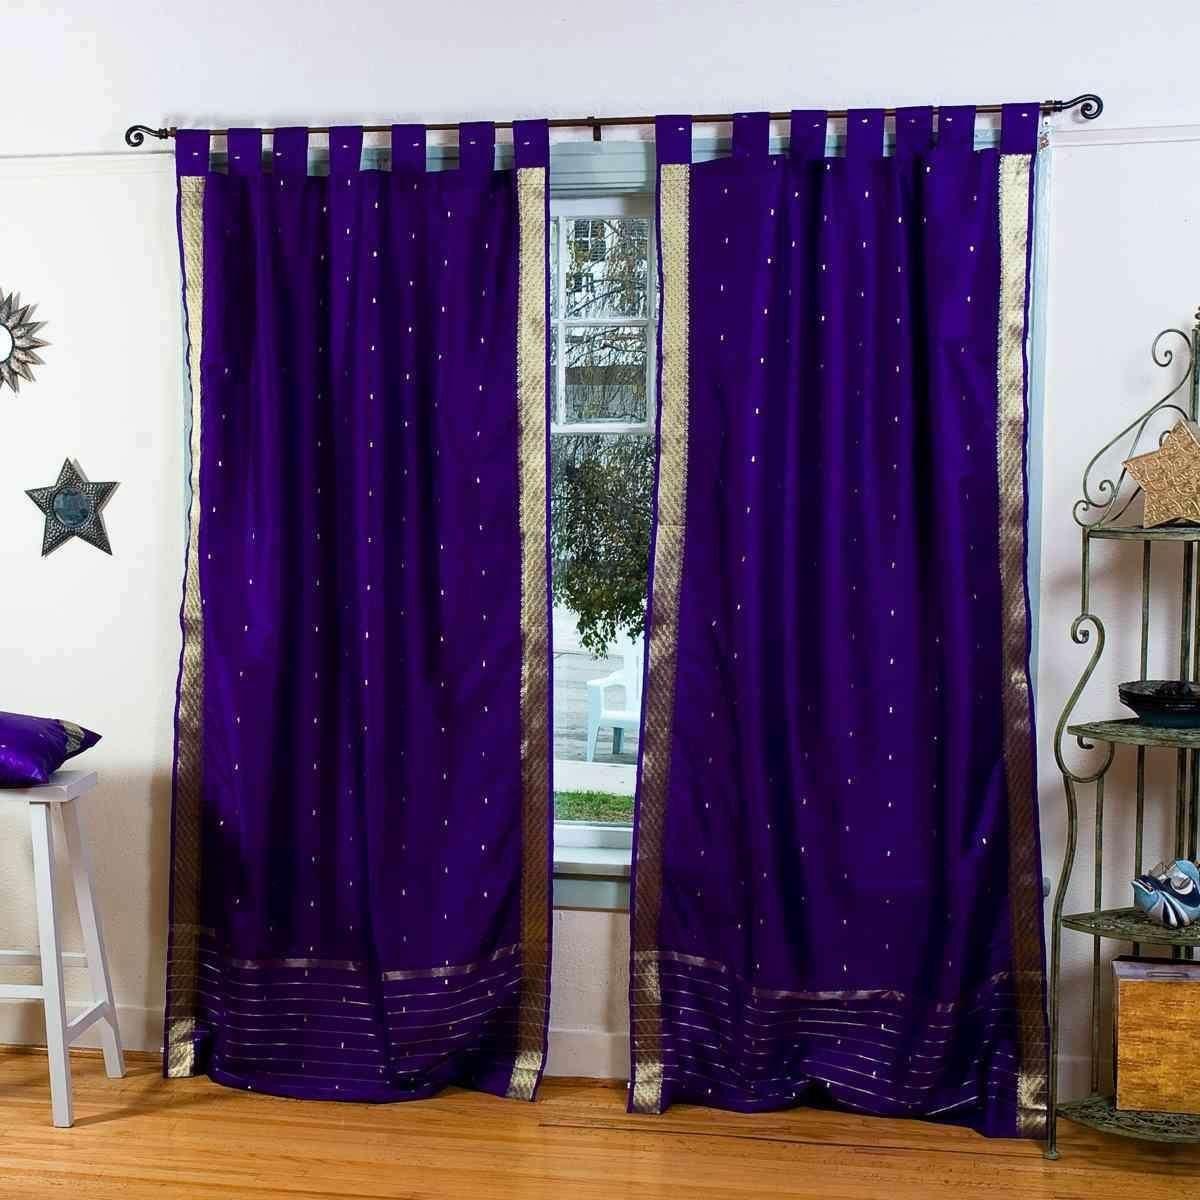 Linedpurple Tab Top Sheer Sari Curtain Drape Panel 80w X 63l